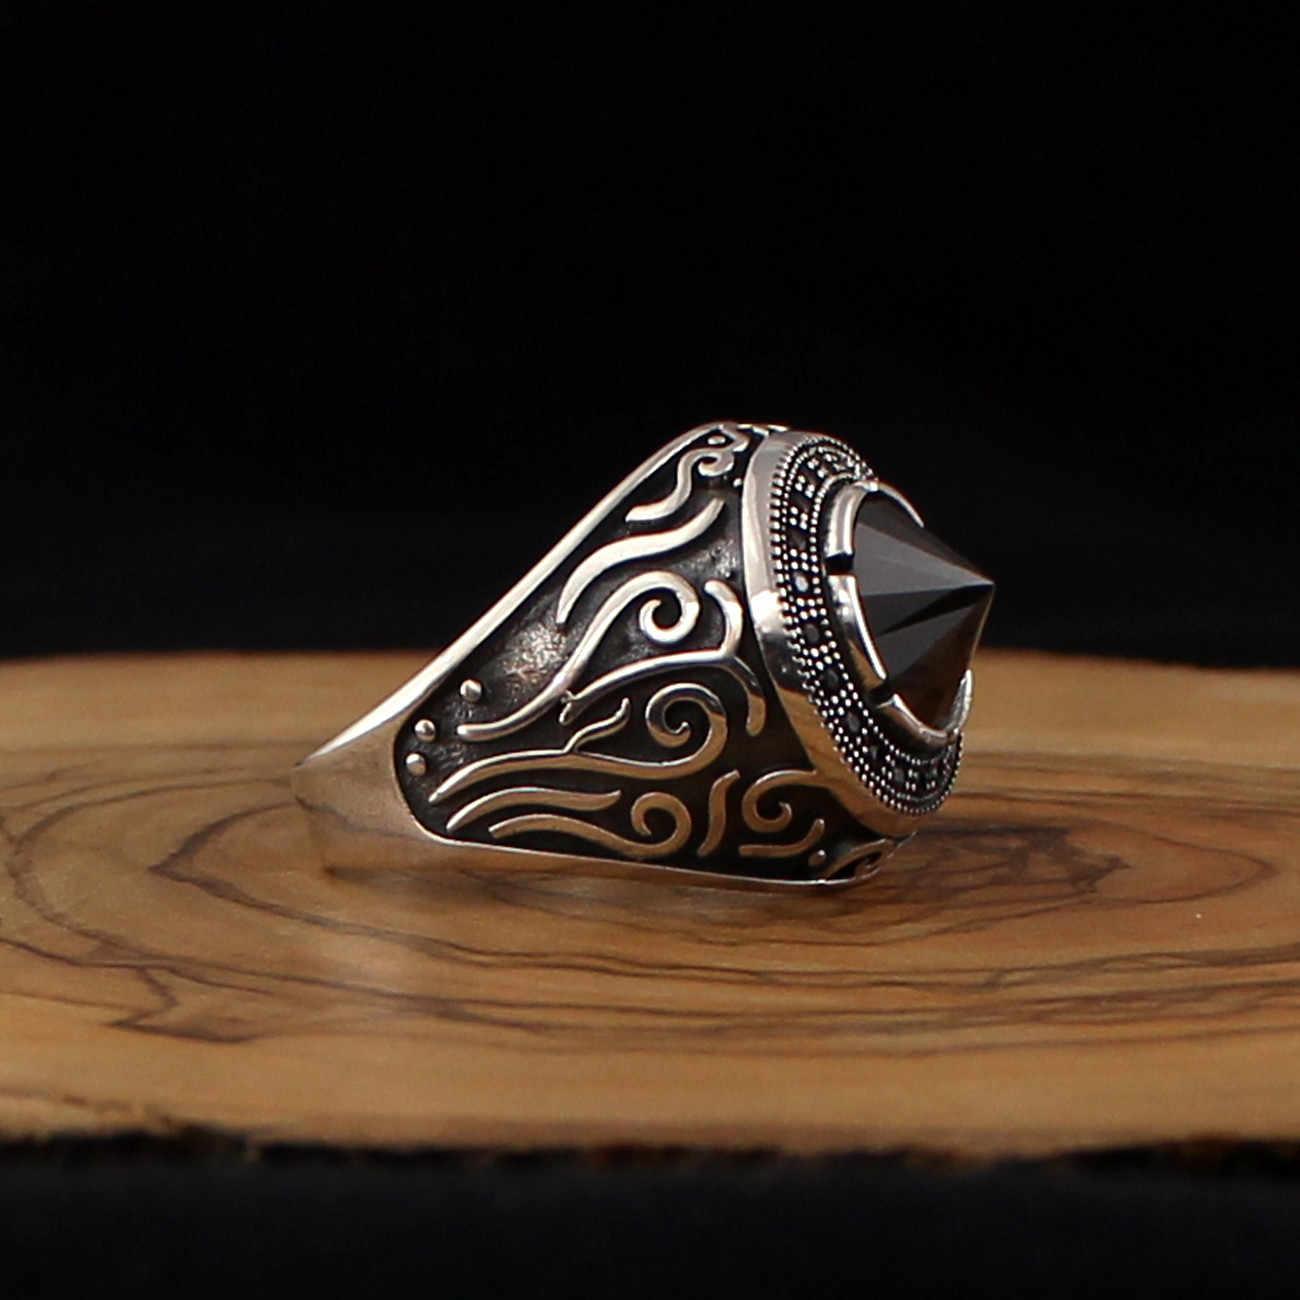 Gemstone Turquoise Stone Luxury Vintage Model 925 Sterling Silver Hardness Ring Gift For Men